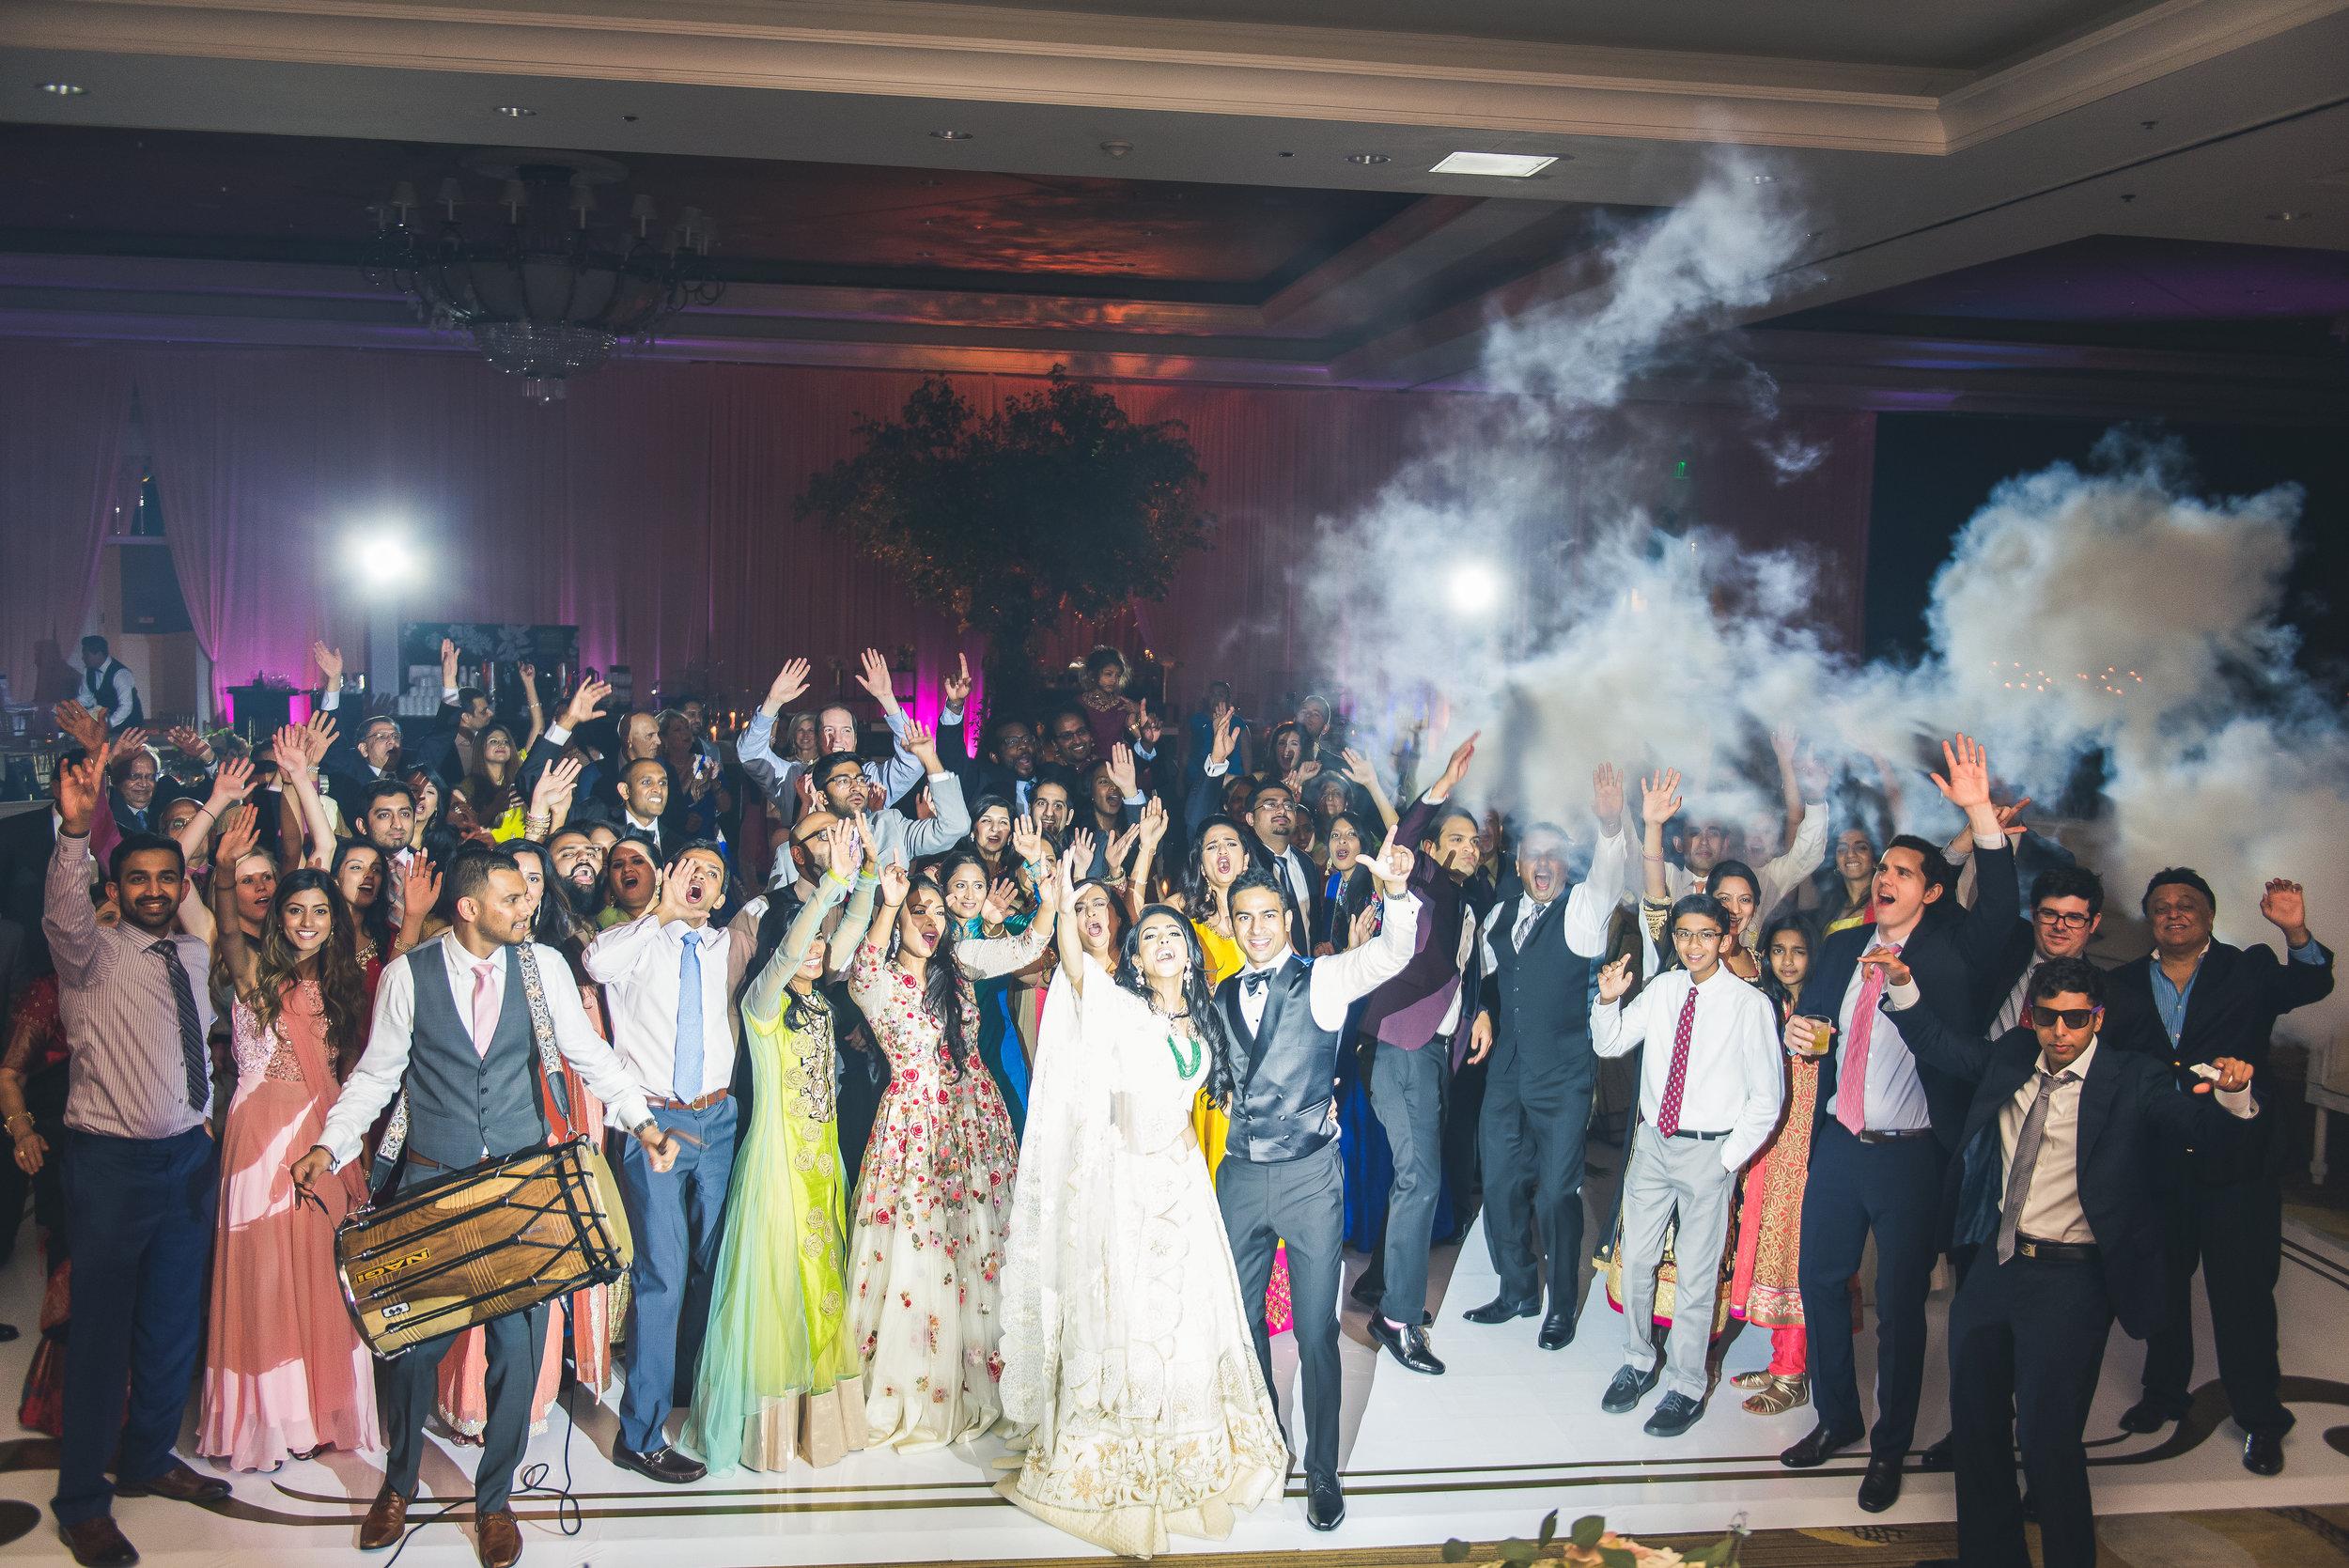 kenya-weddings-aekta-viren-14.jpg